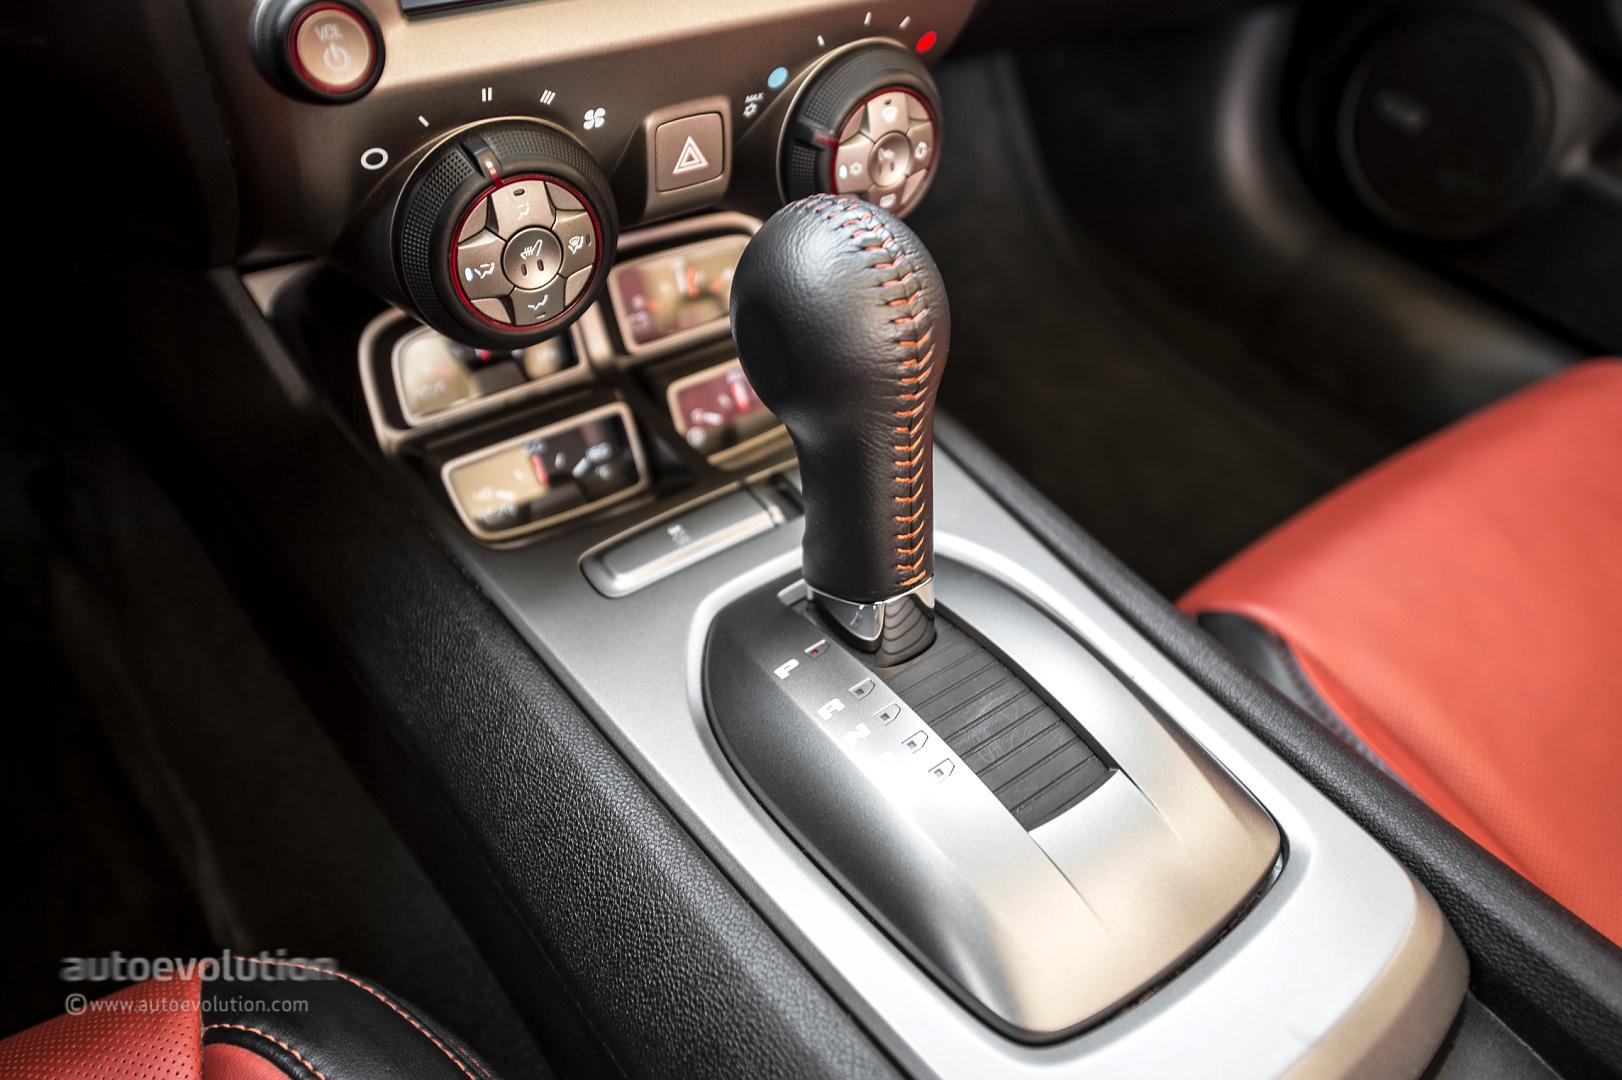 2014 CHEVROLET Camaro RS Convertible Review Autoevolution